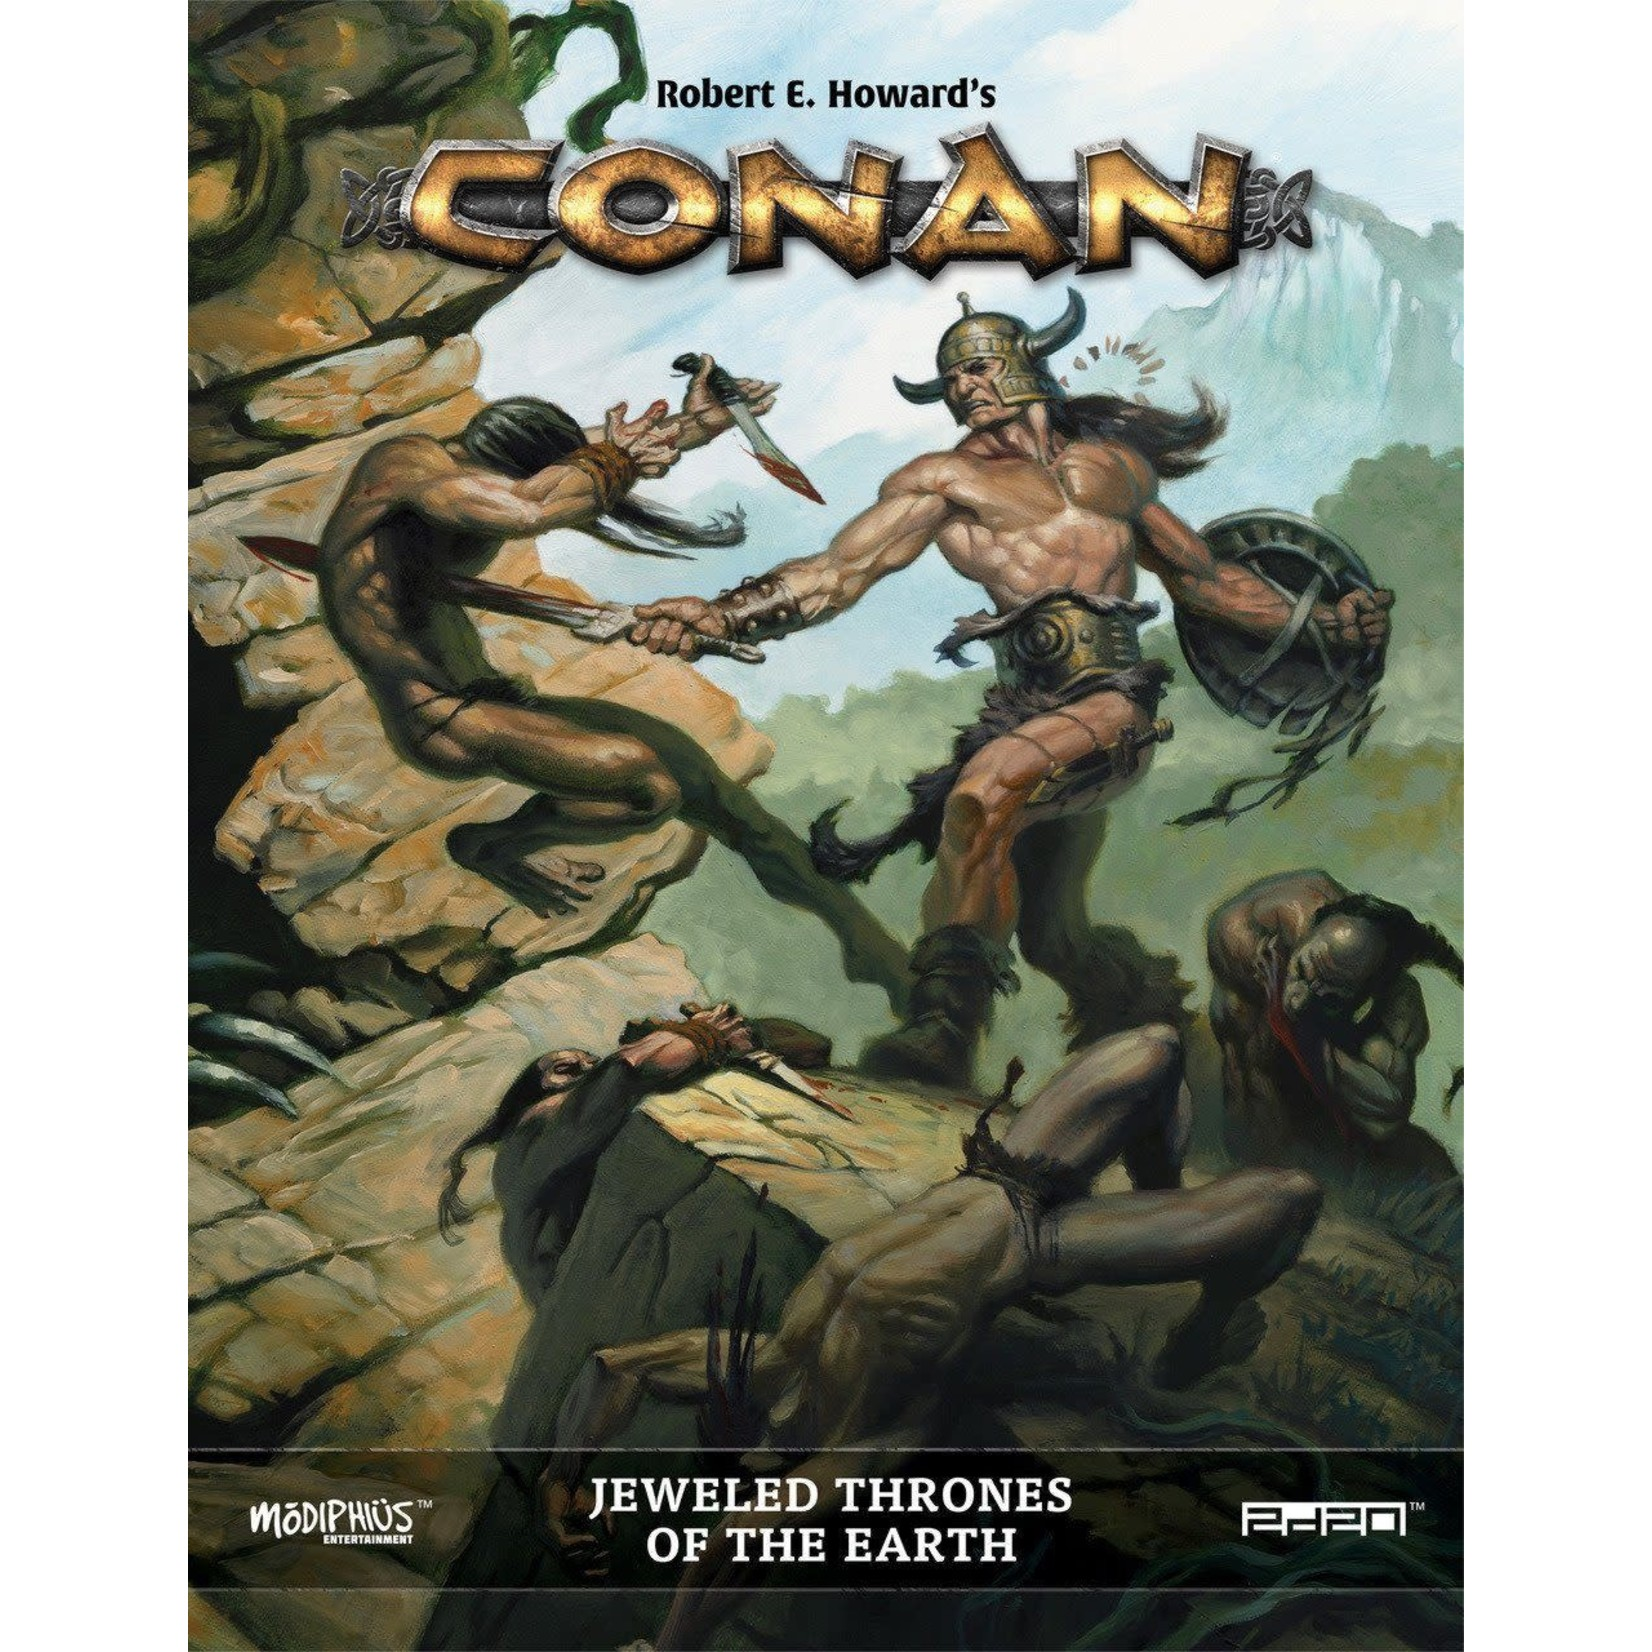 Conan: Jeweled Thrones of the Earth Adventure Module